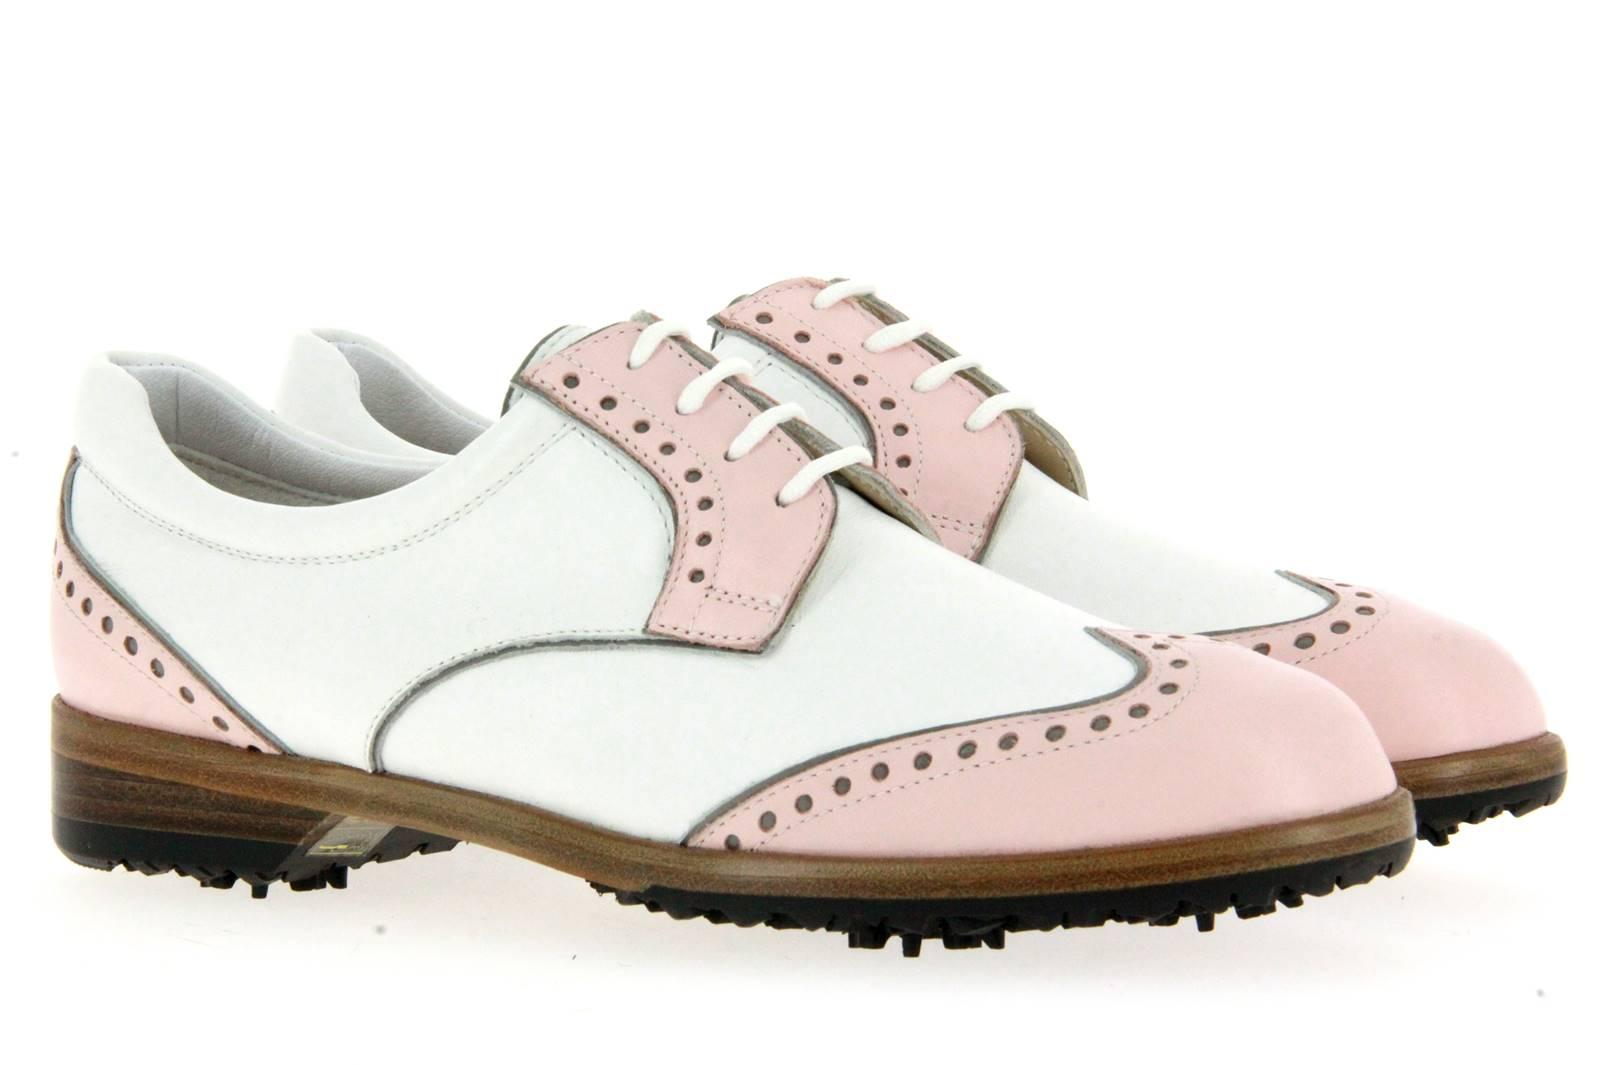 Tee Golf Shoes Damen- Golfschuh SALLY ROSA BIANCO (36½)